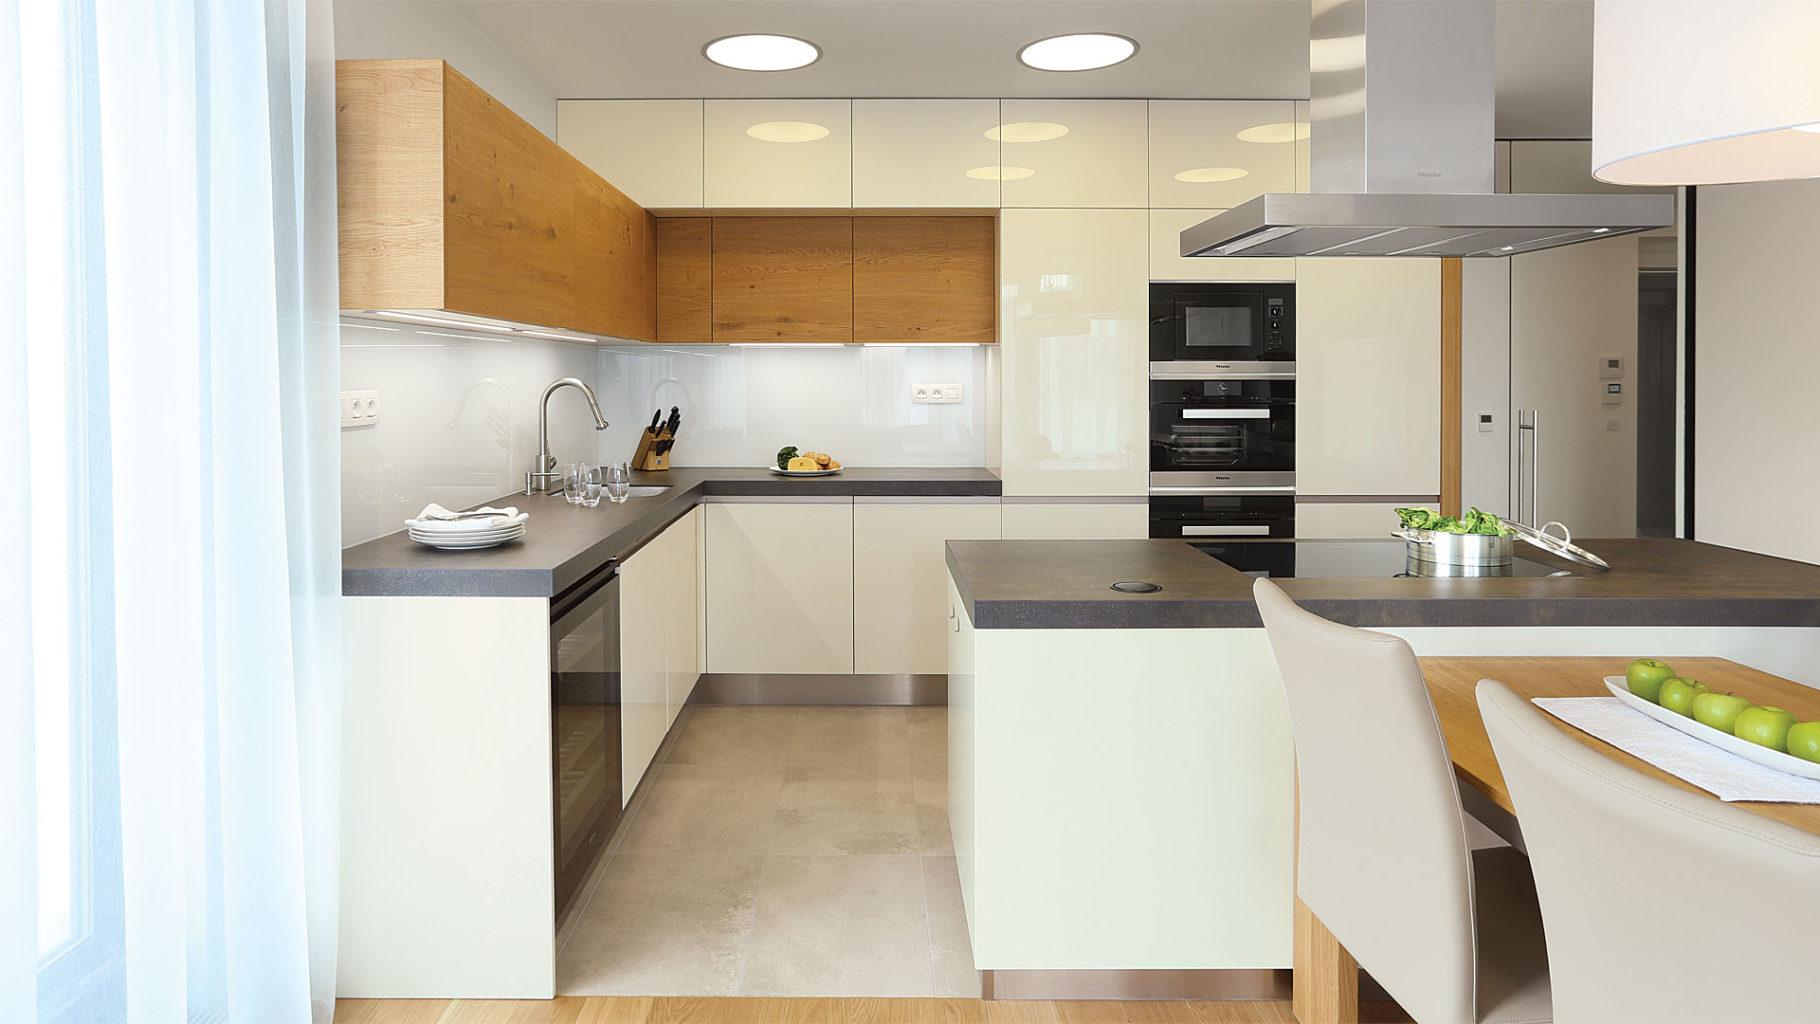 leskla svetla kuchyne kombinace vanilka lesk a dyha s tmavou pracovni deskou z prirodniho kamene